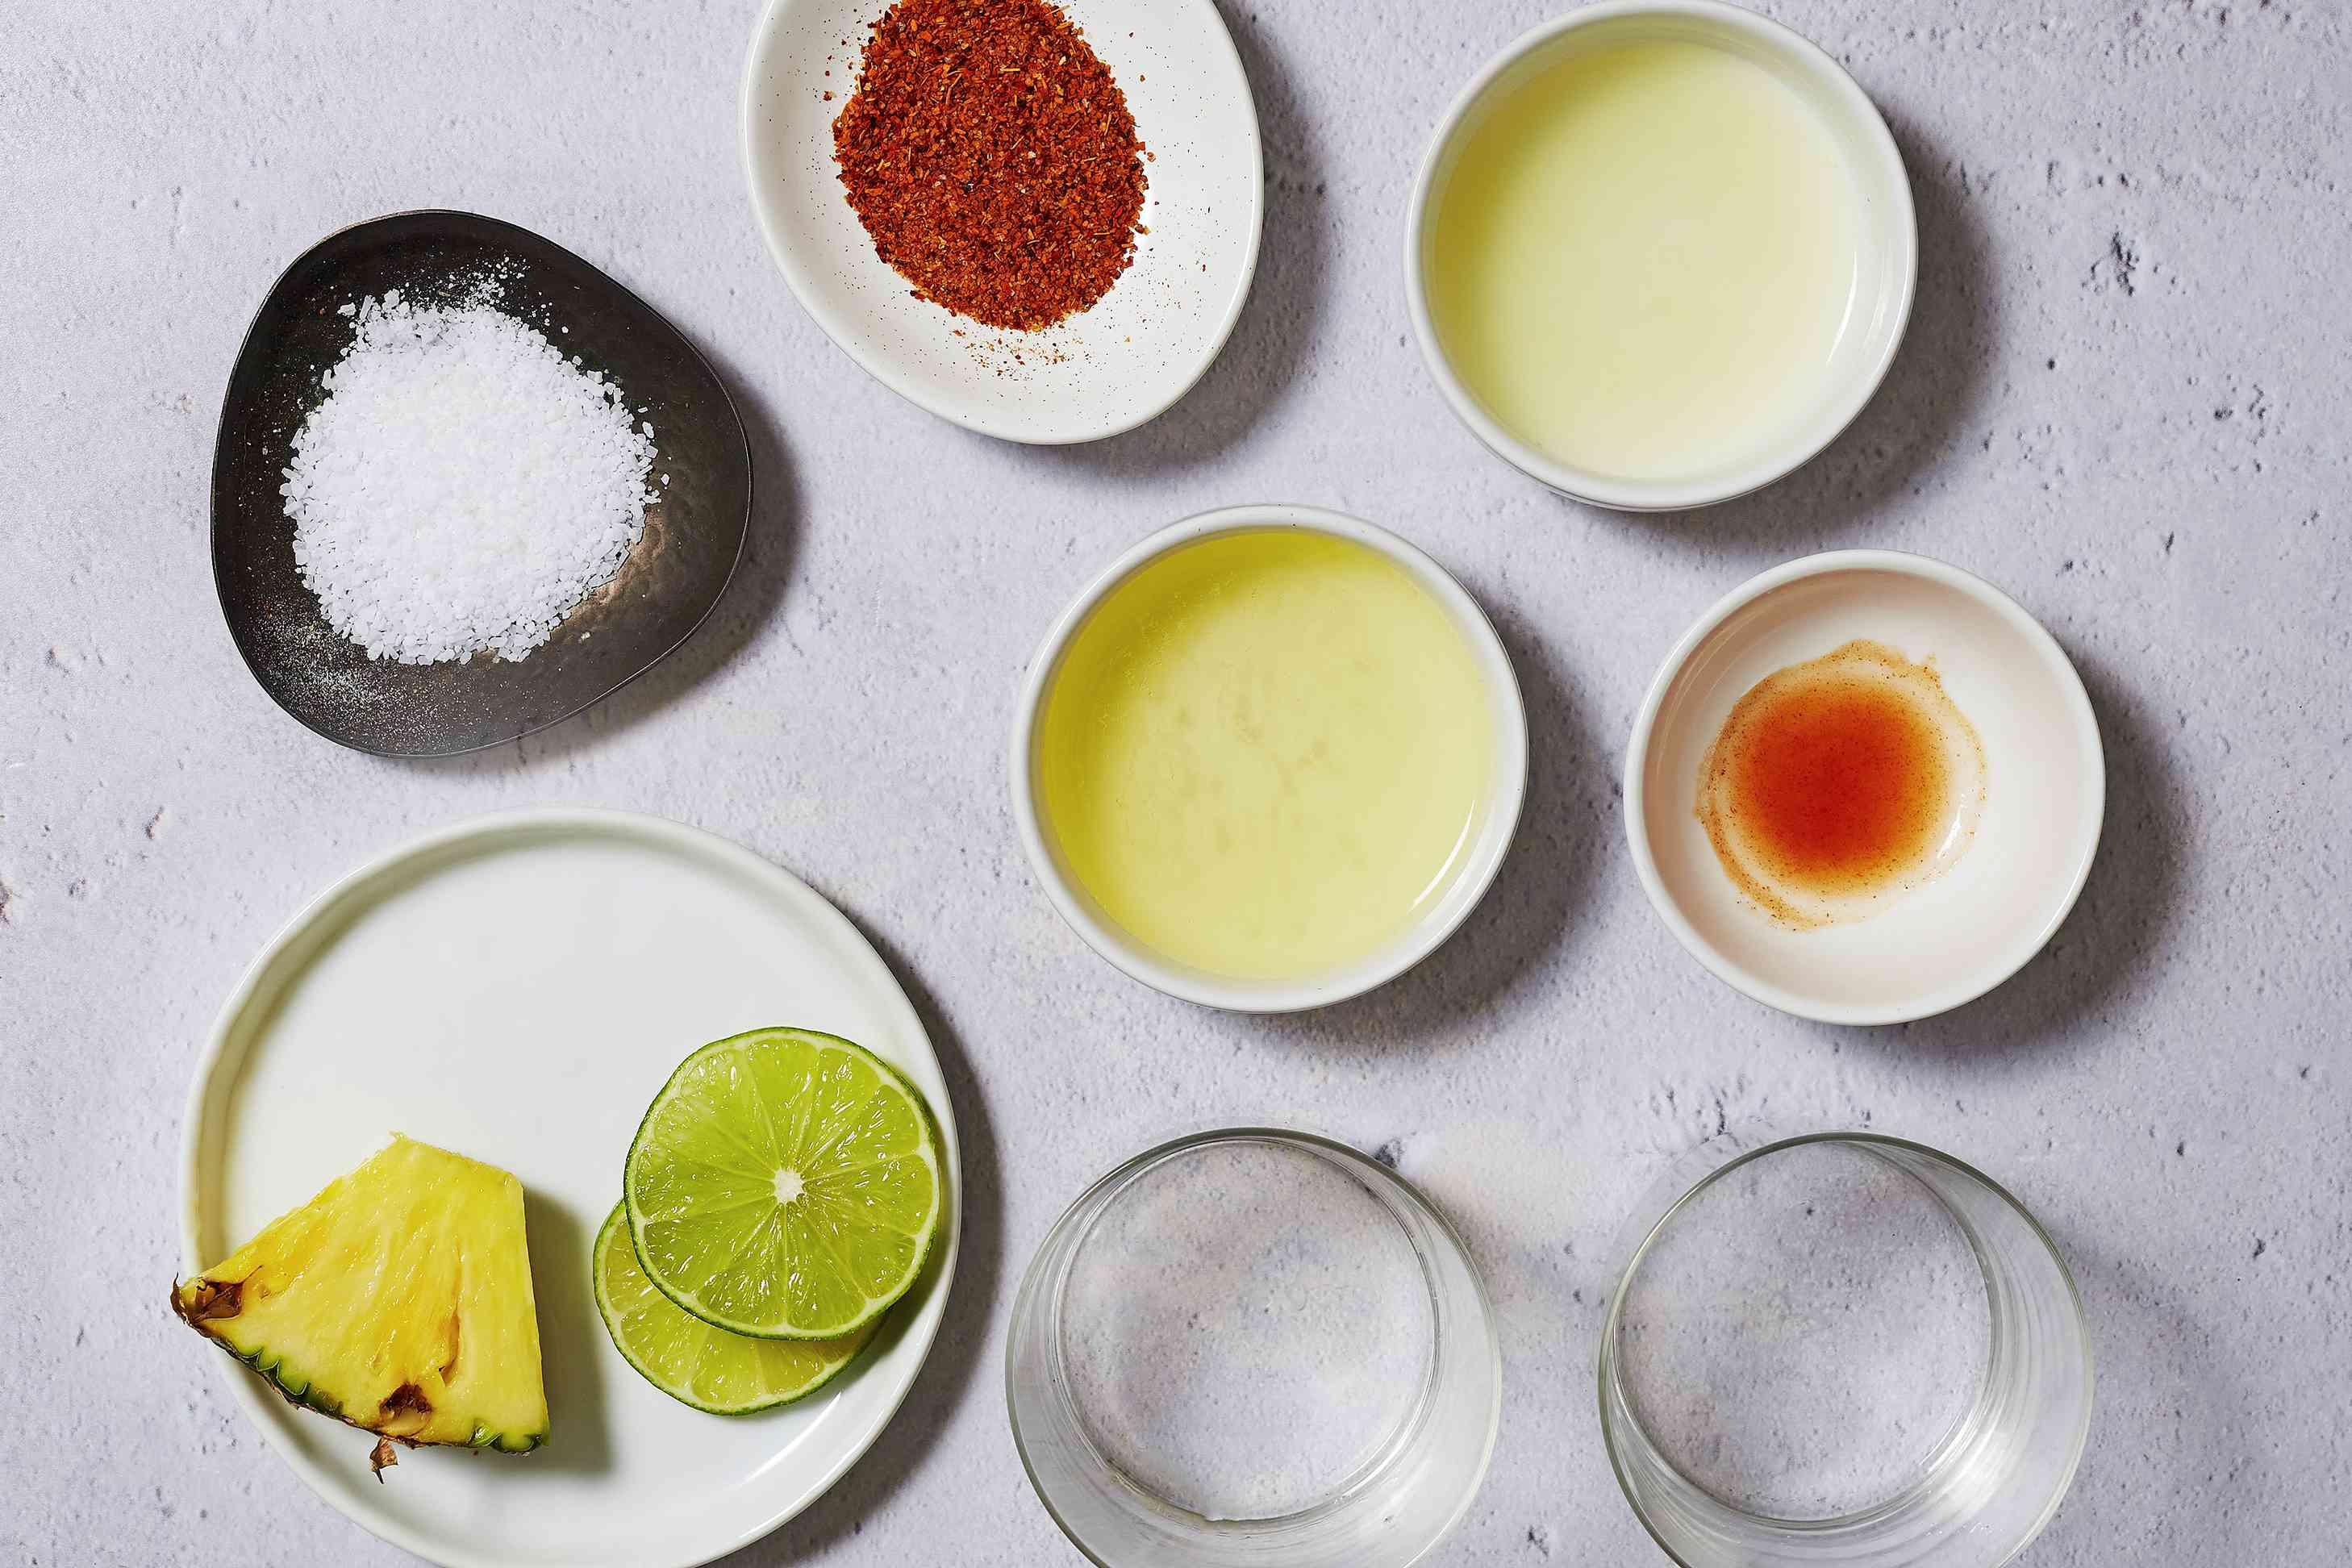 Pineapple Chili Margarita ingredients